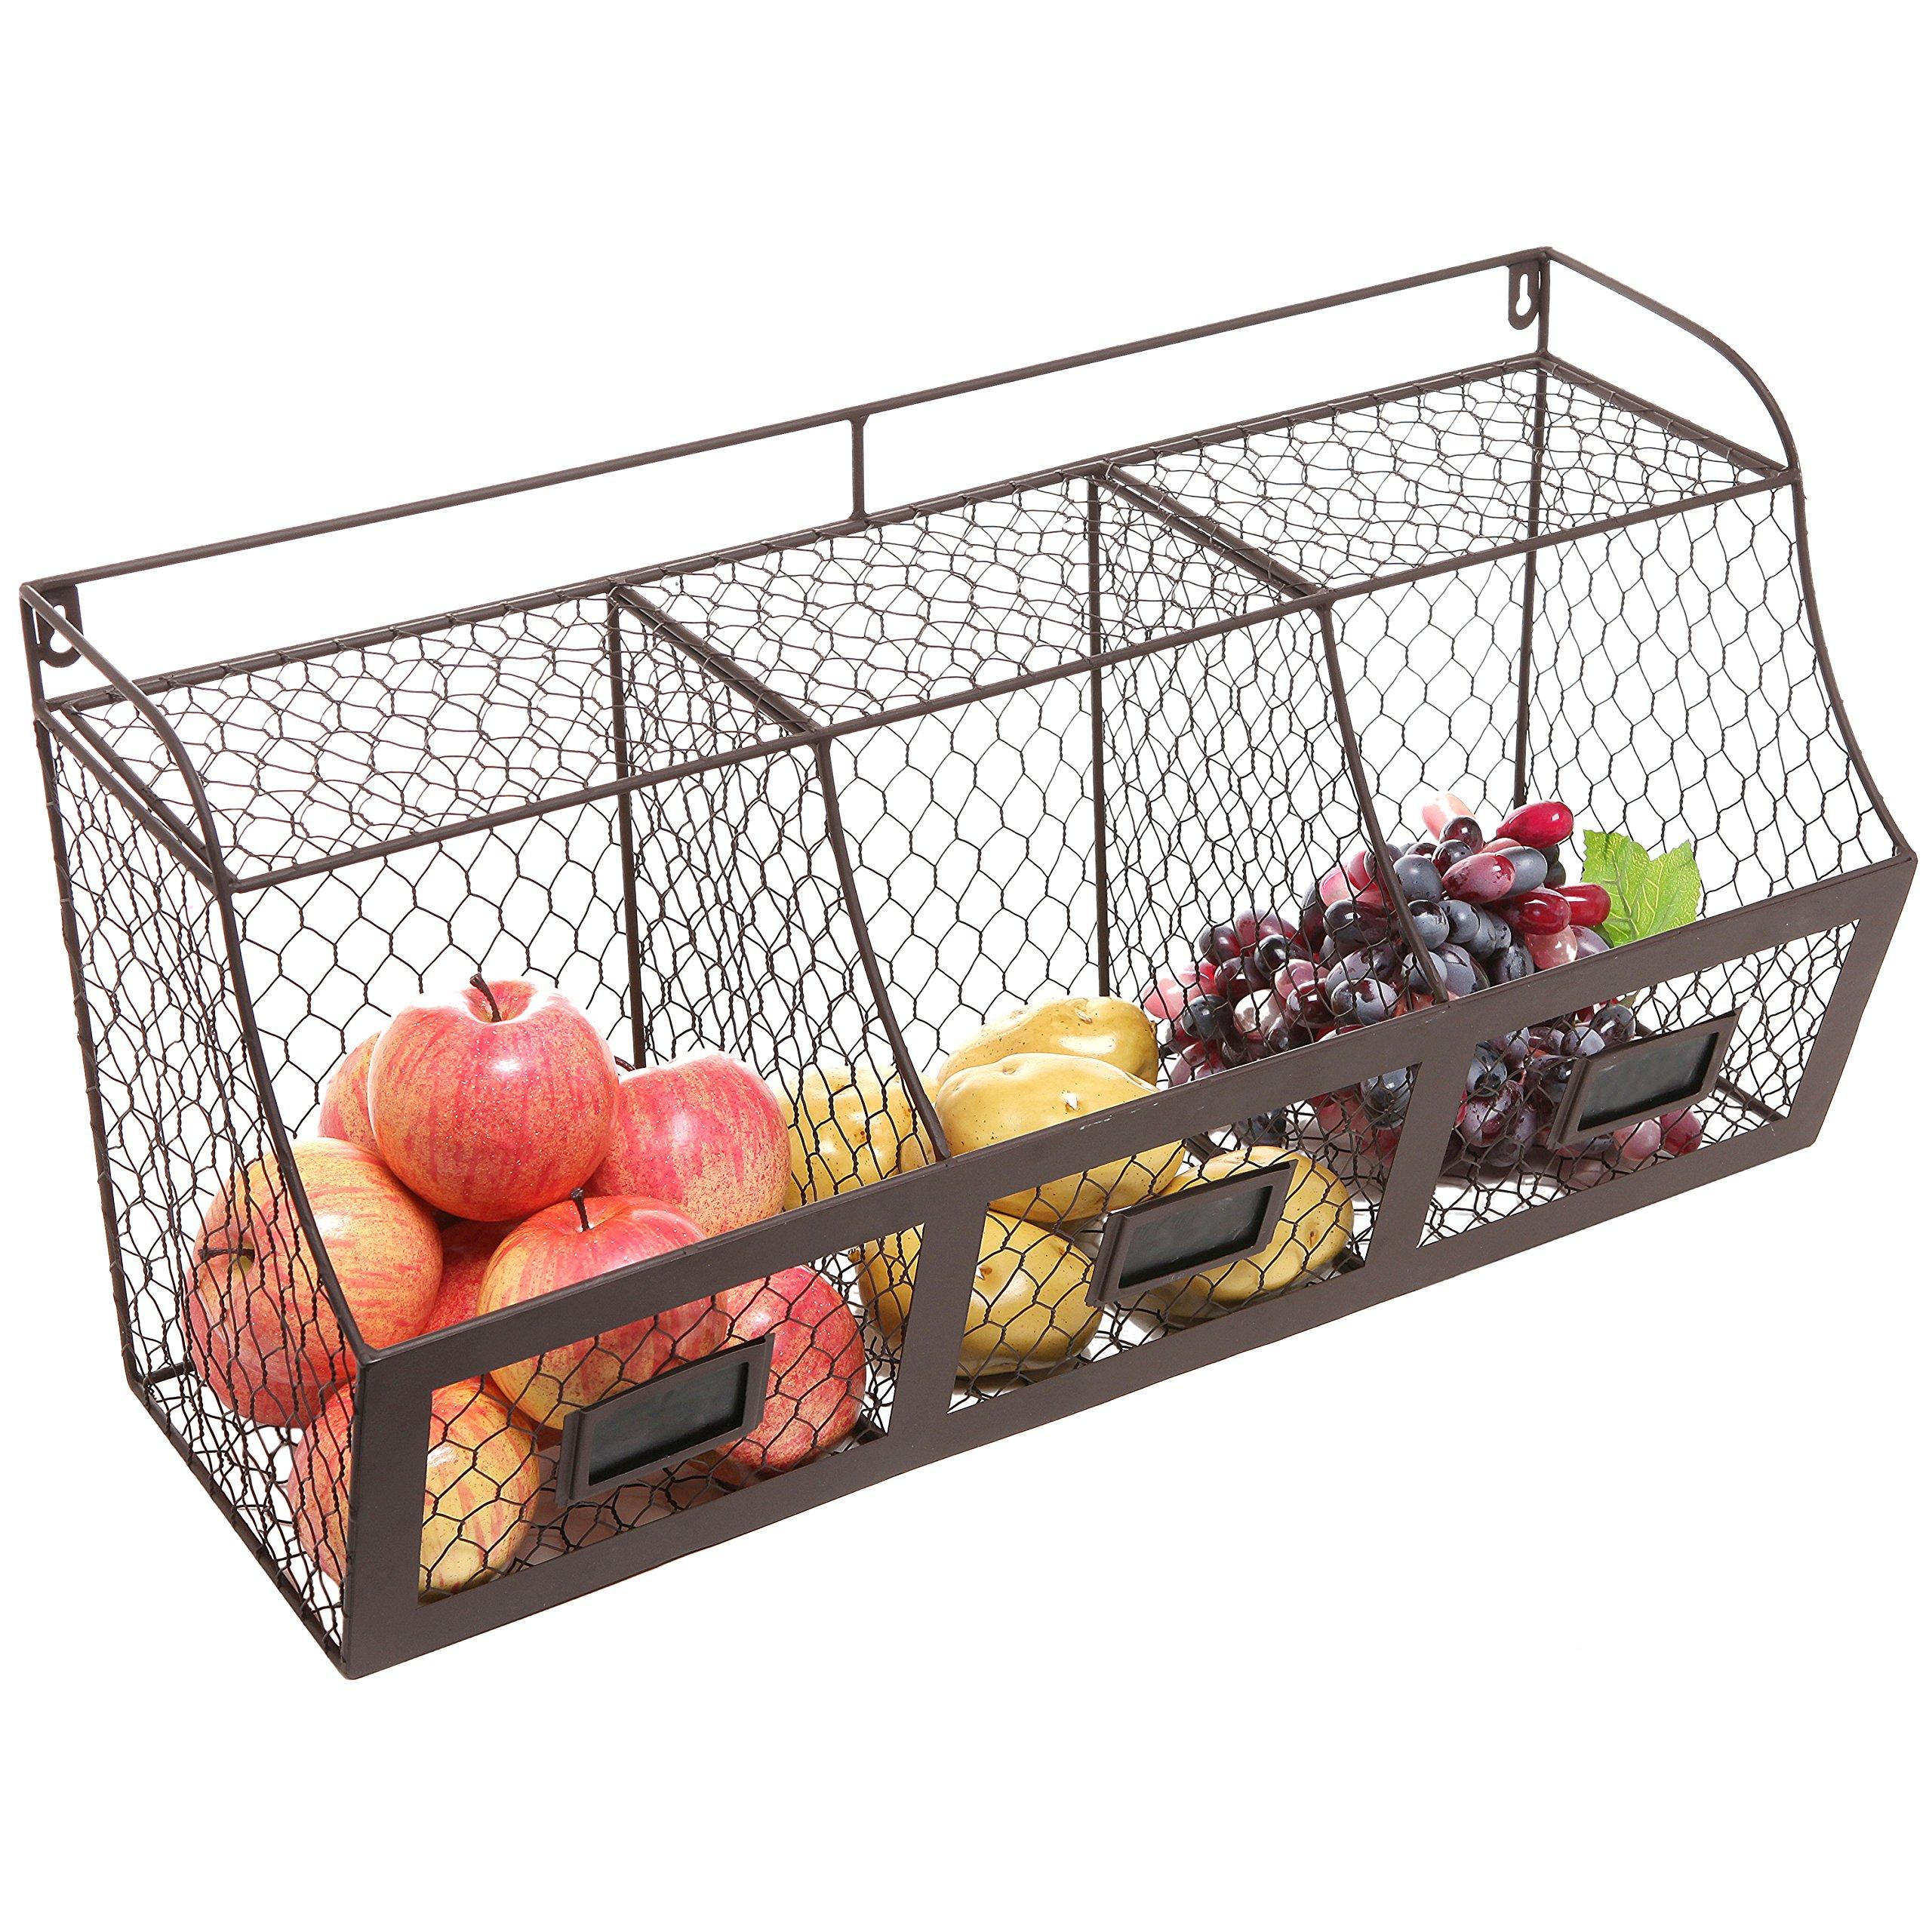 Rangement Fruits Et Légumes: Large Rustic Brown Metal Wire Wall Mounted Hanging Fruit